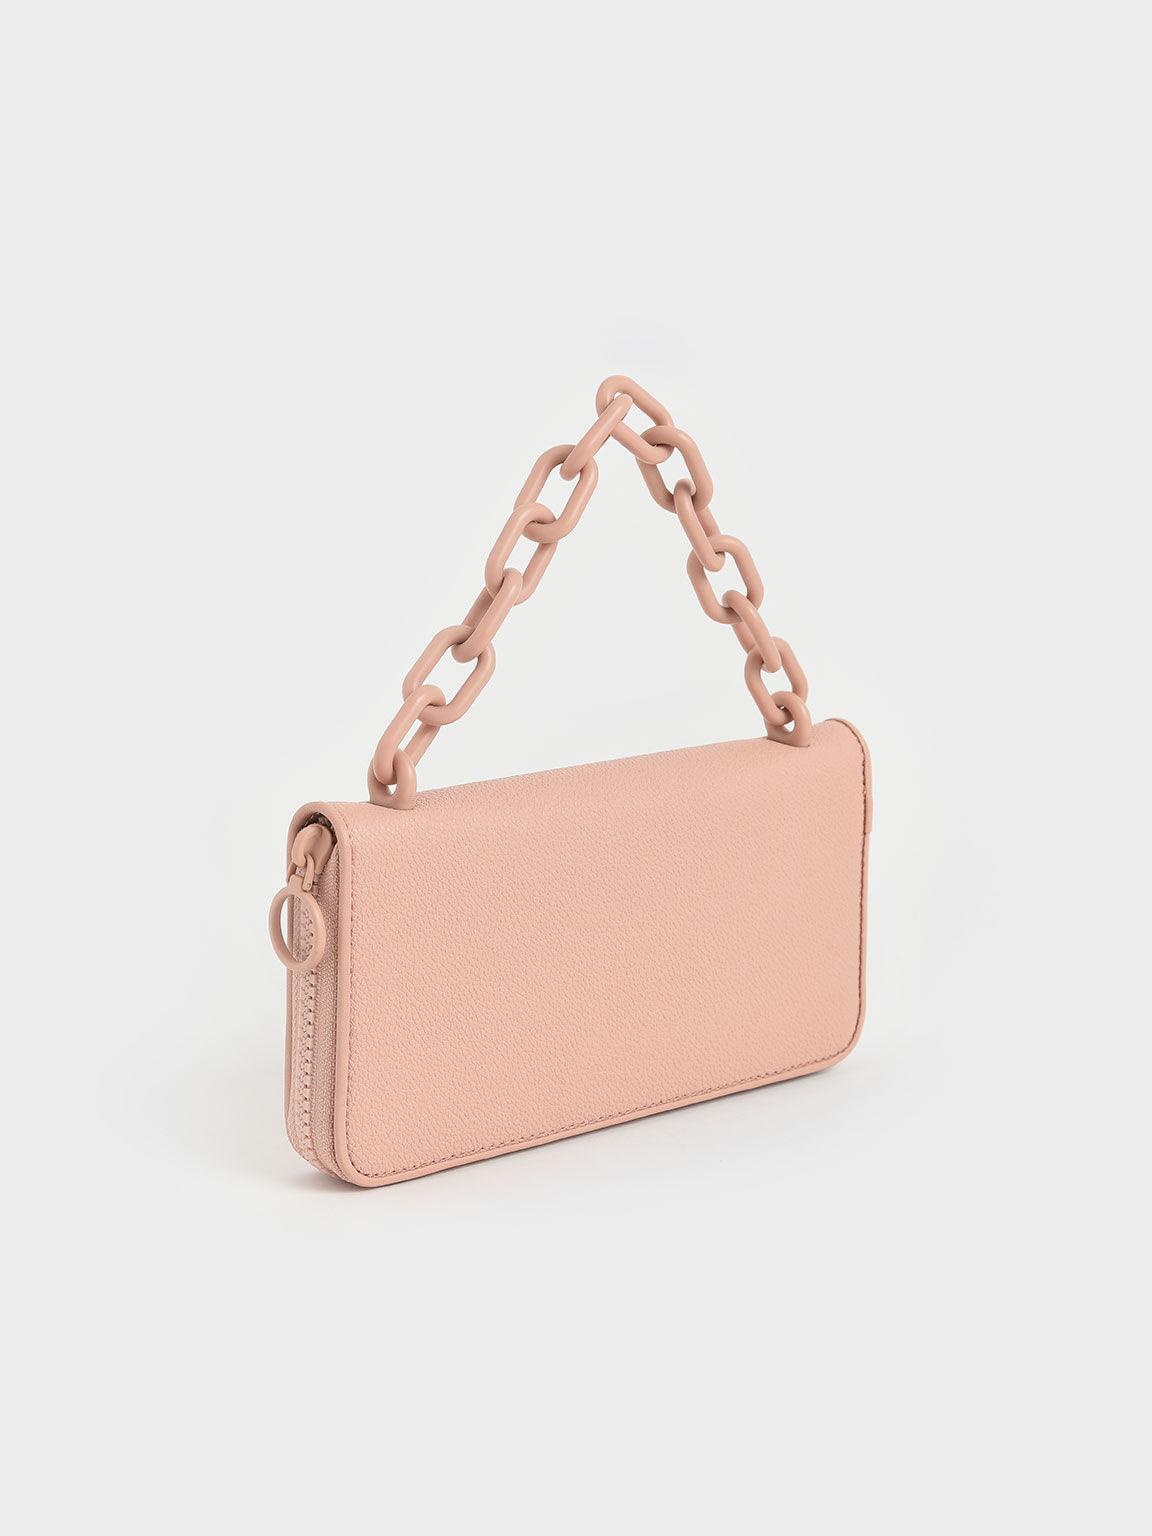 Chain Link Long Wallet, Blush, hi-res